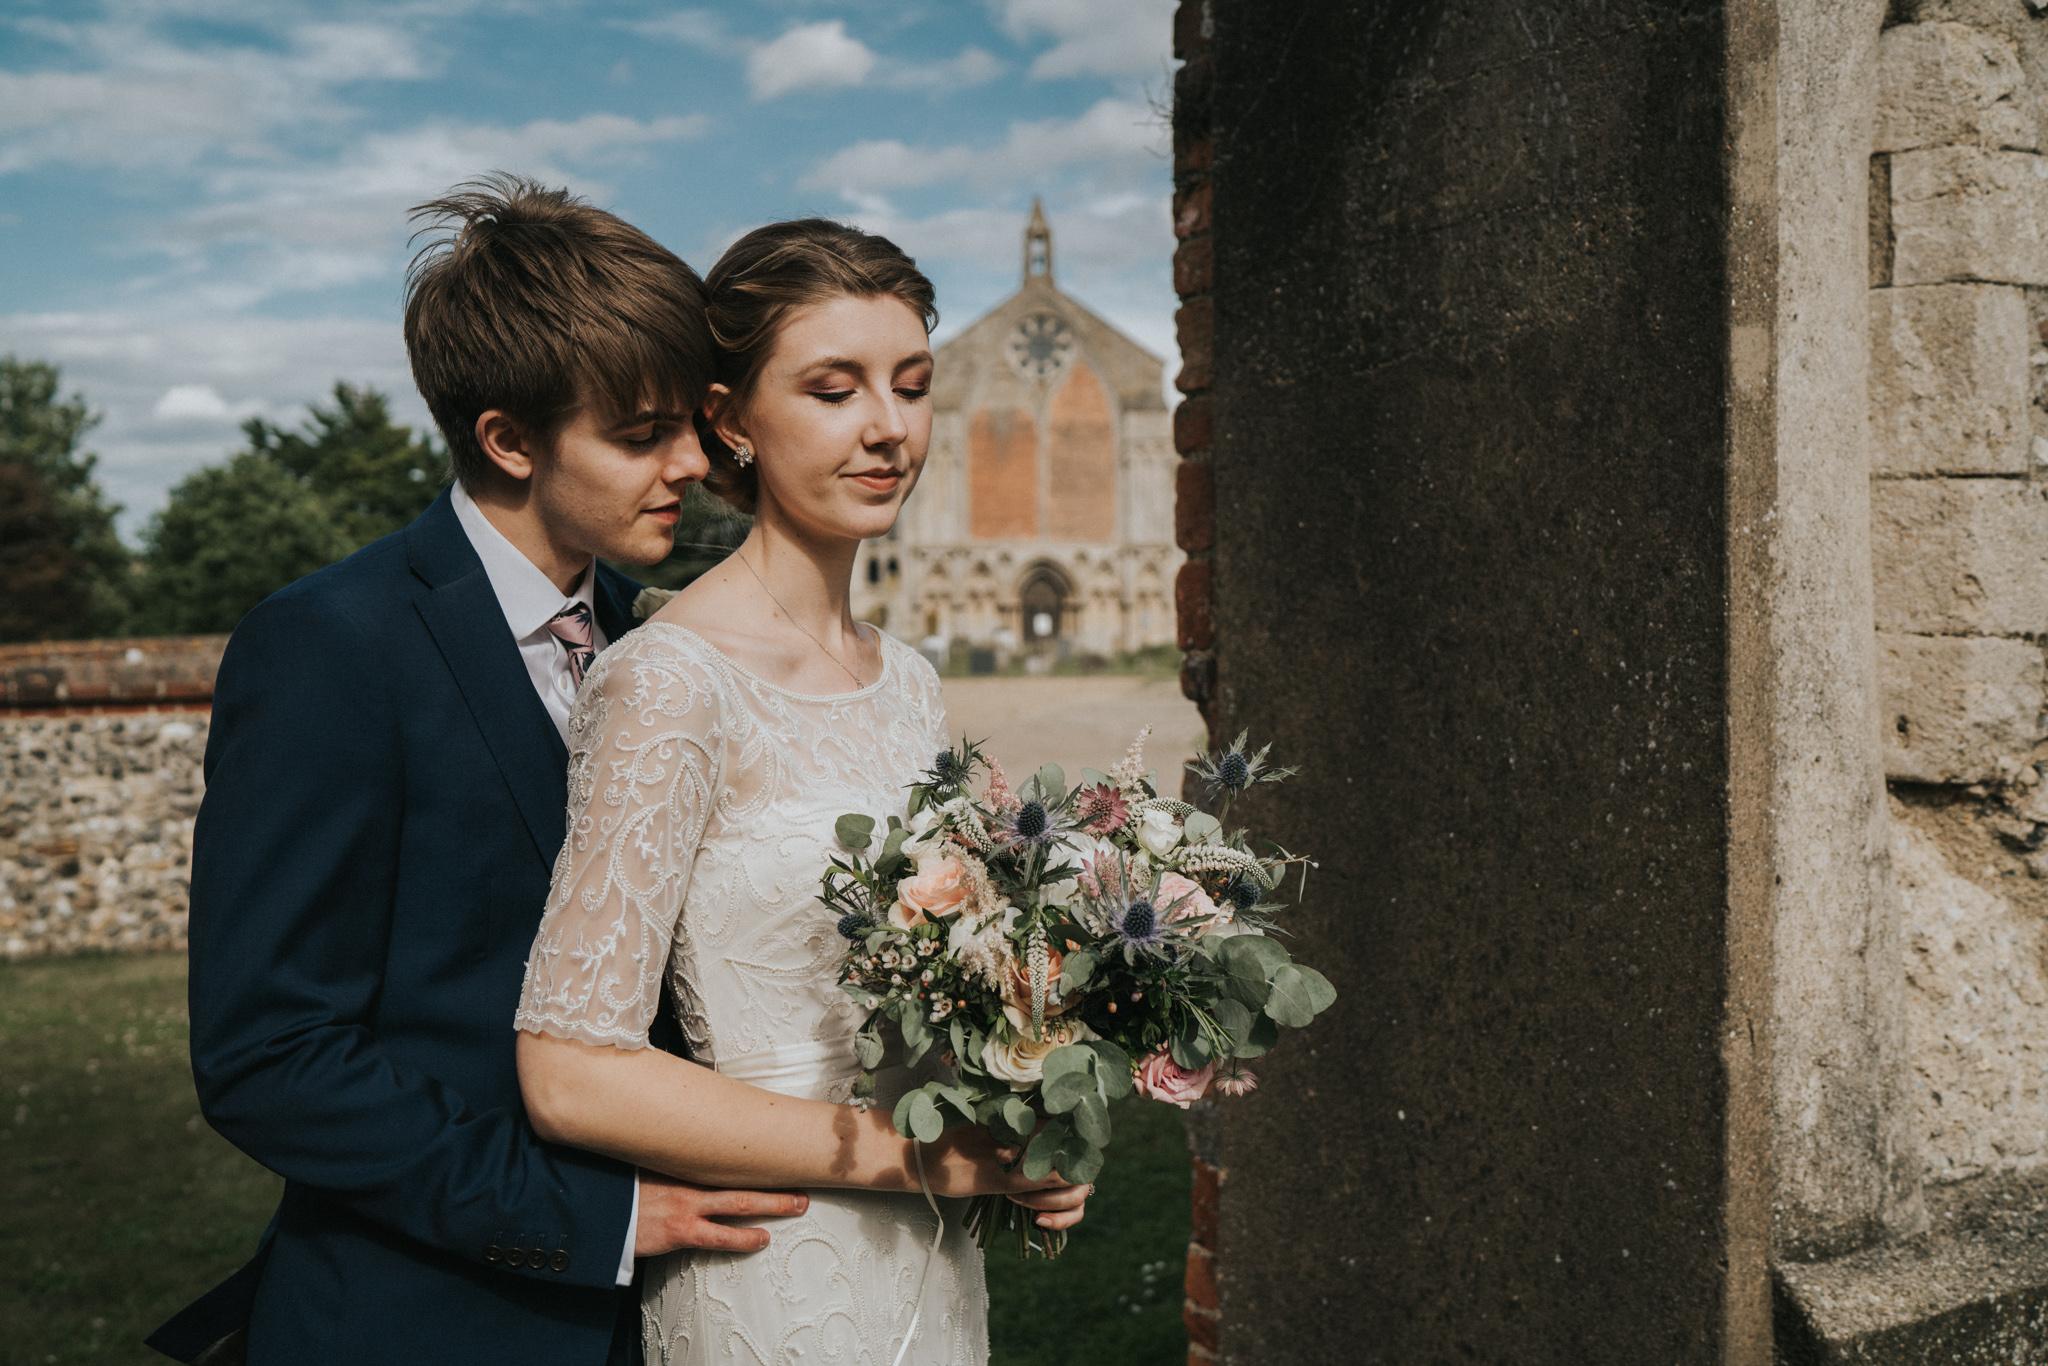 Jess-and-Tom-Norfolk-Alternative-Wedding-Essex-Wedding-Photographer-Grace-Elizabeth-19.jpg